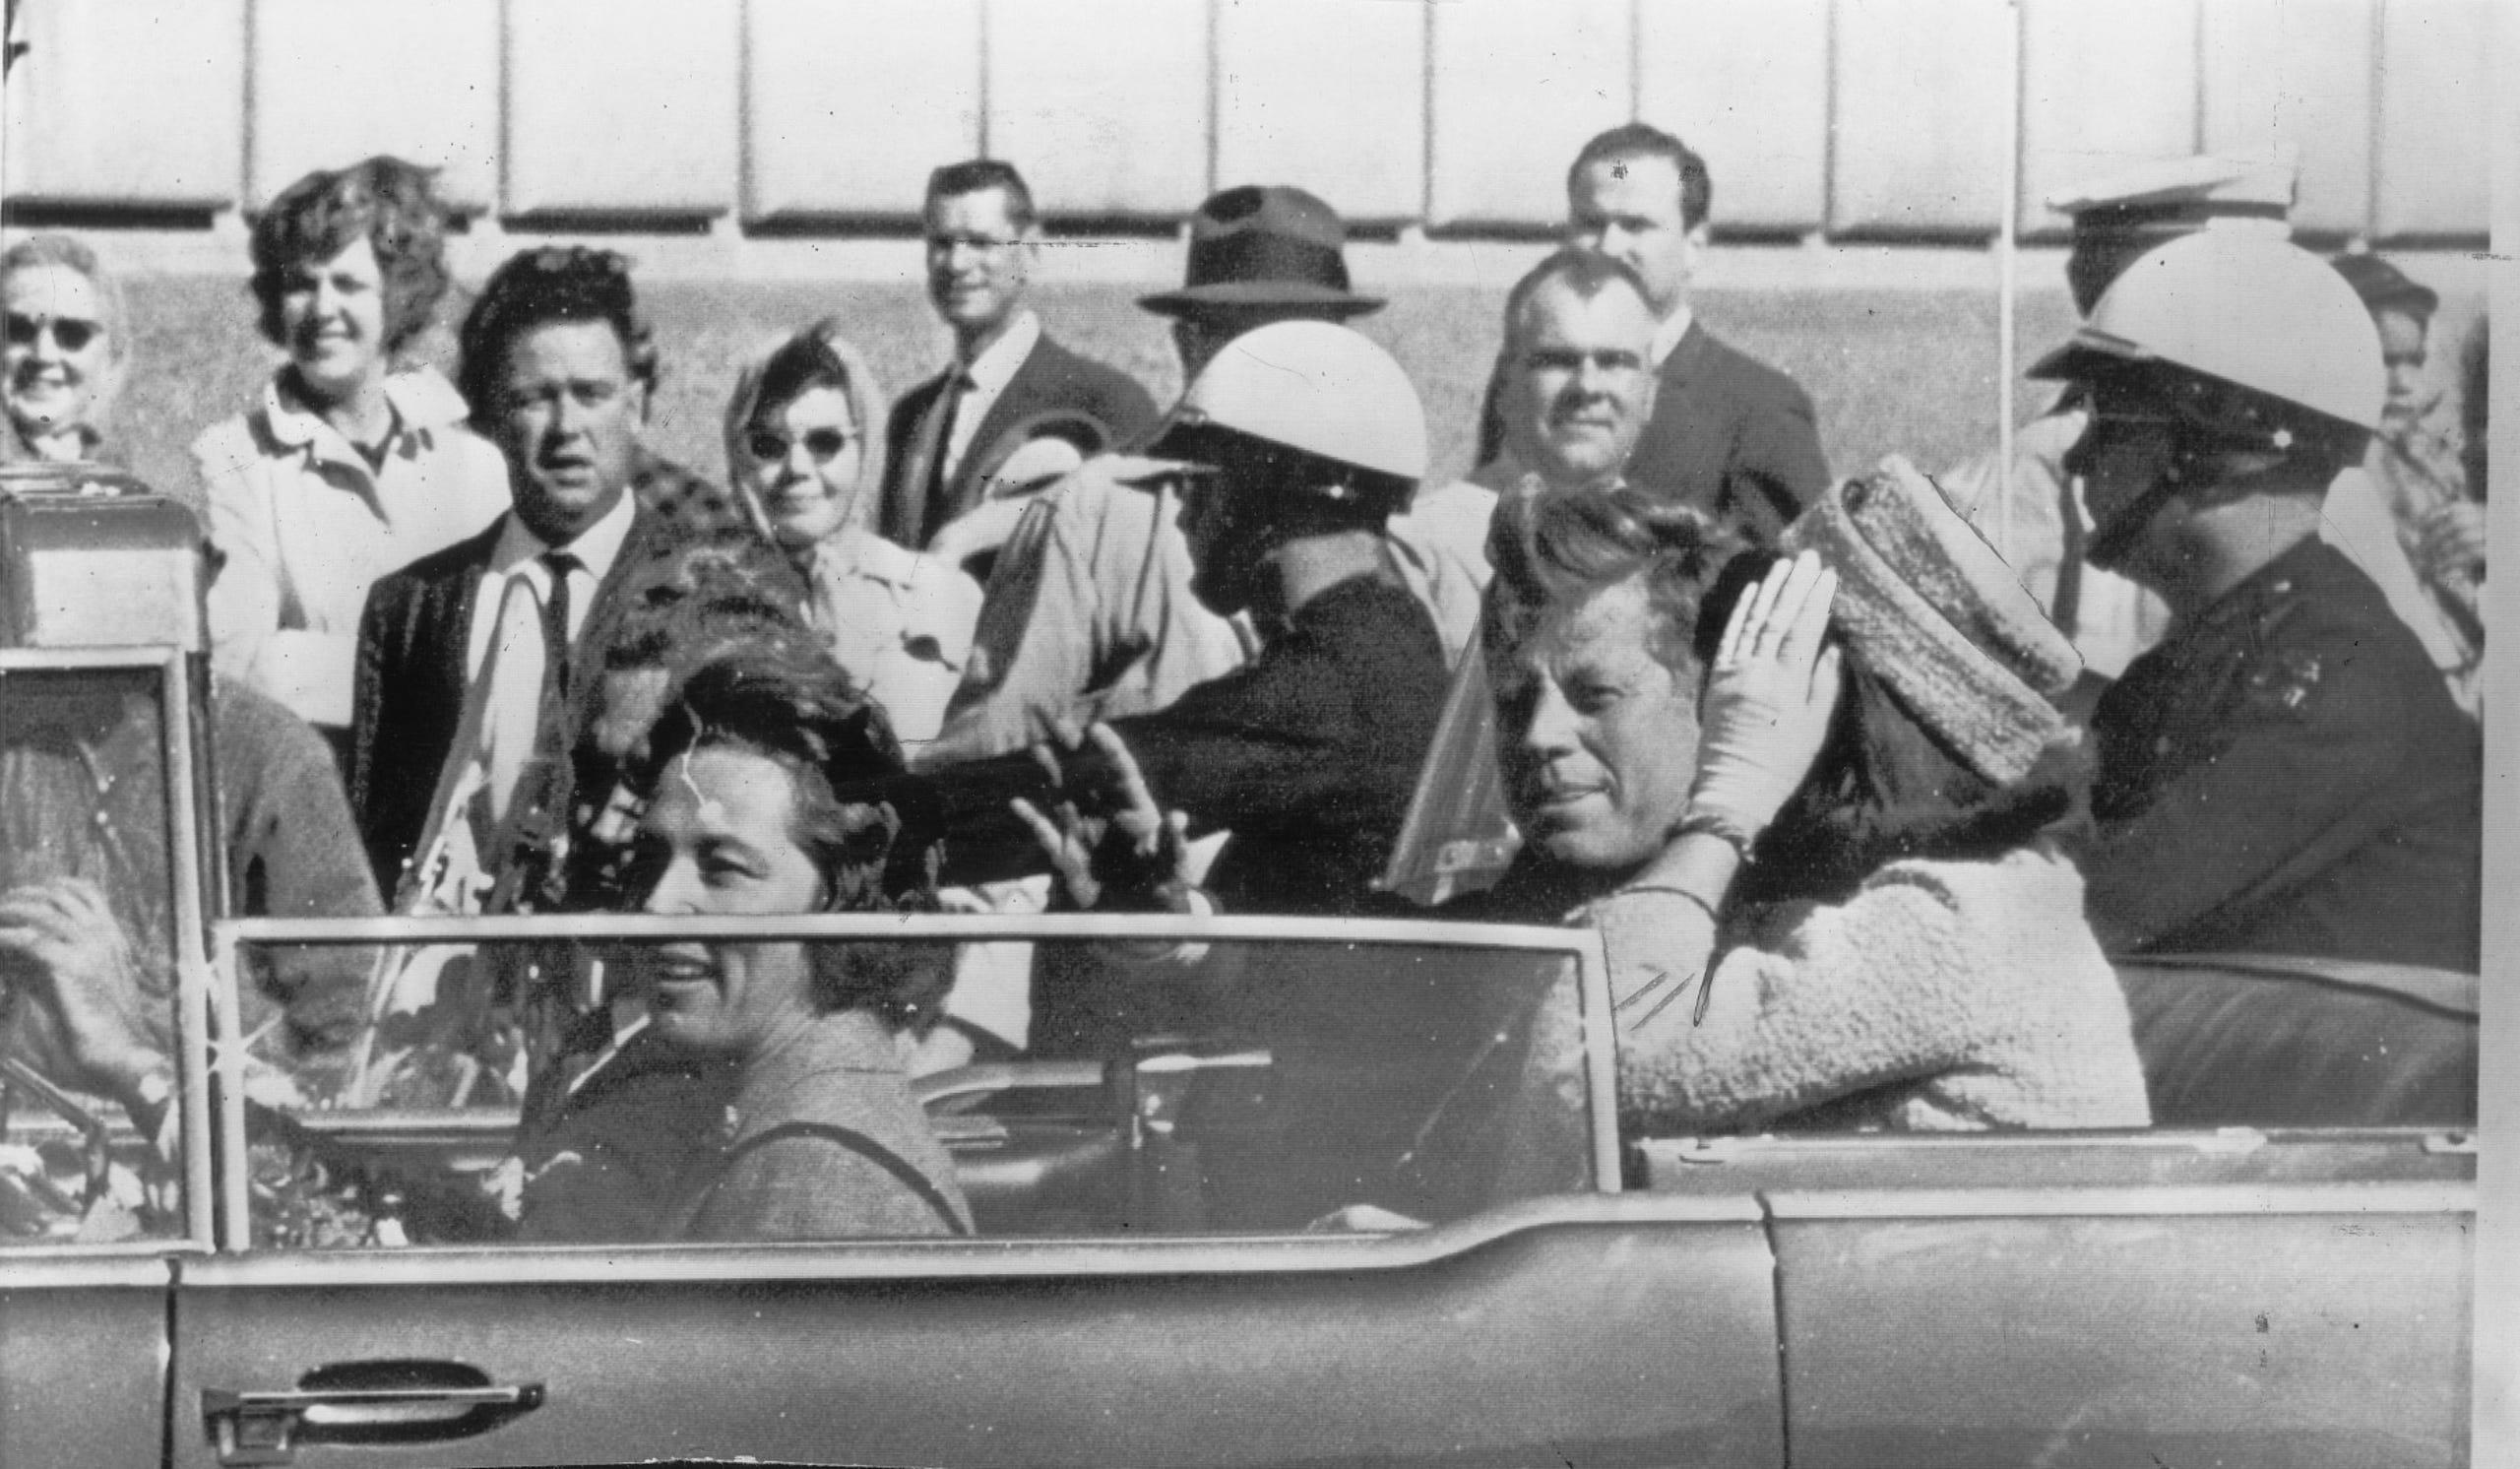 Retro Indy: Assassination of President John F. Kennedy